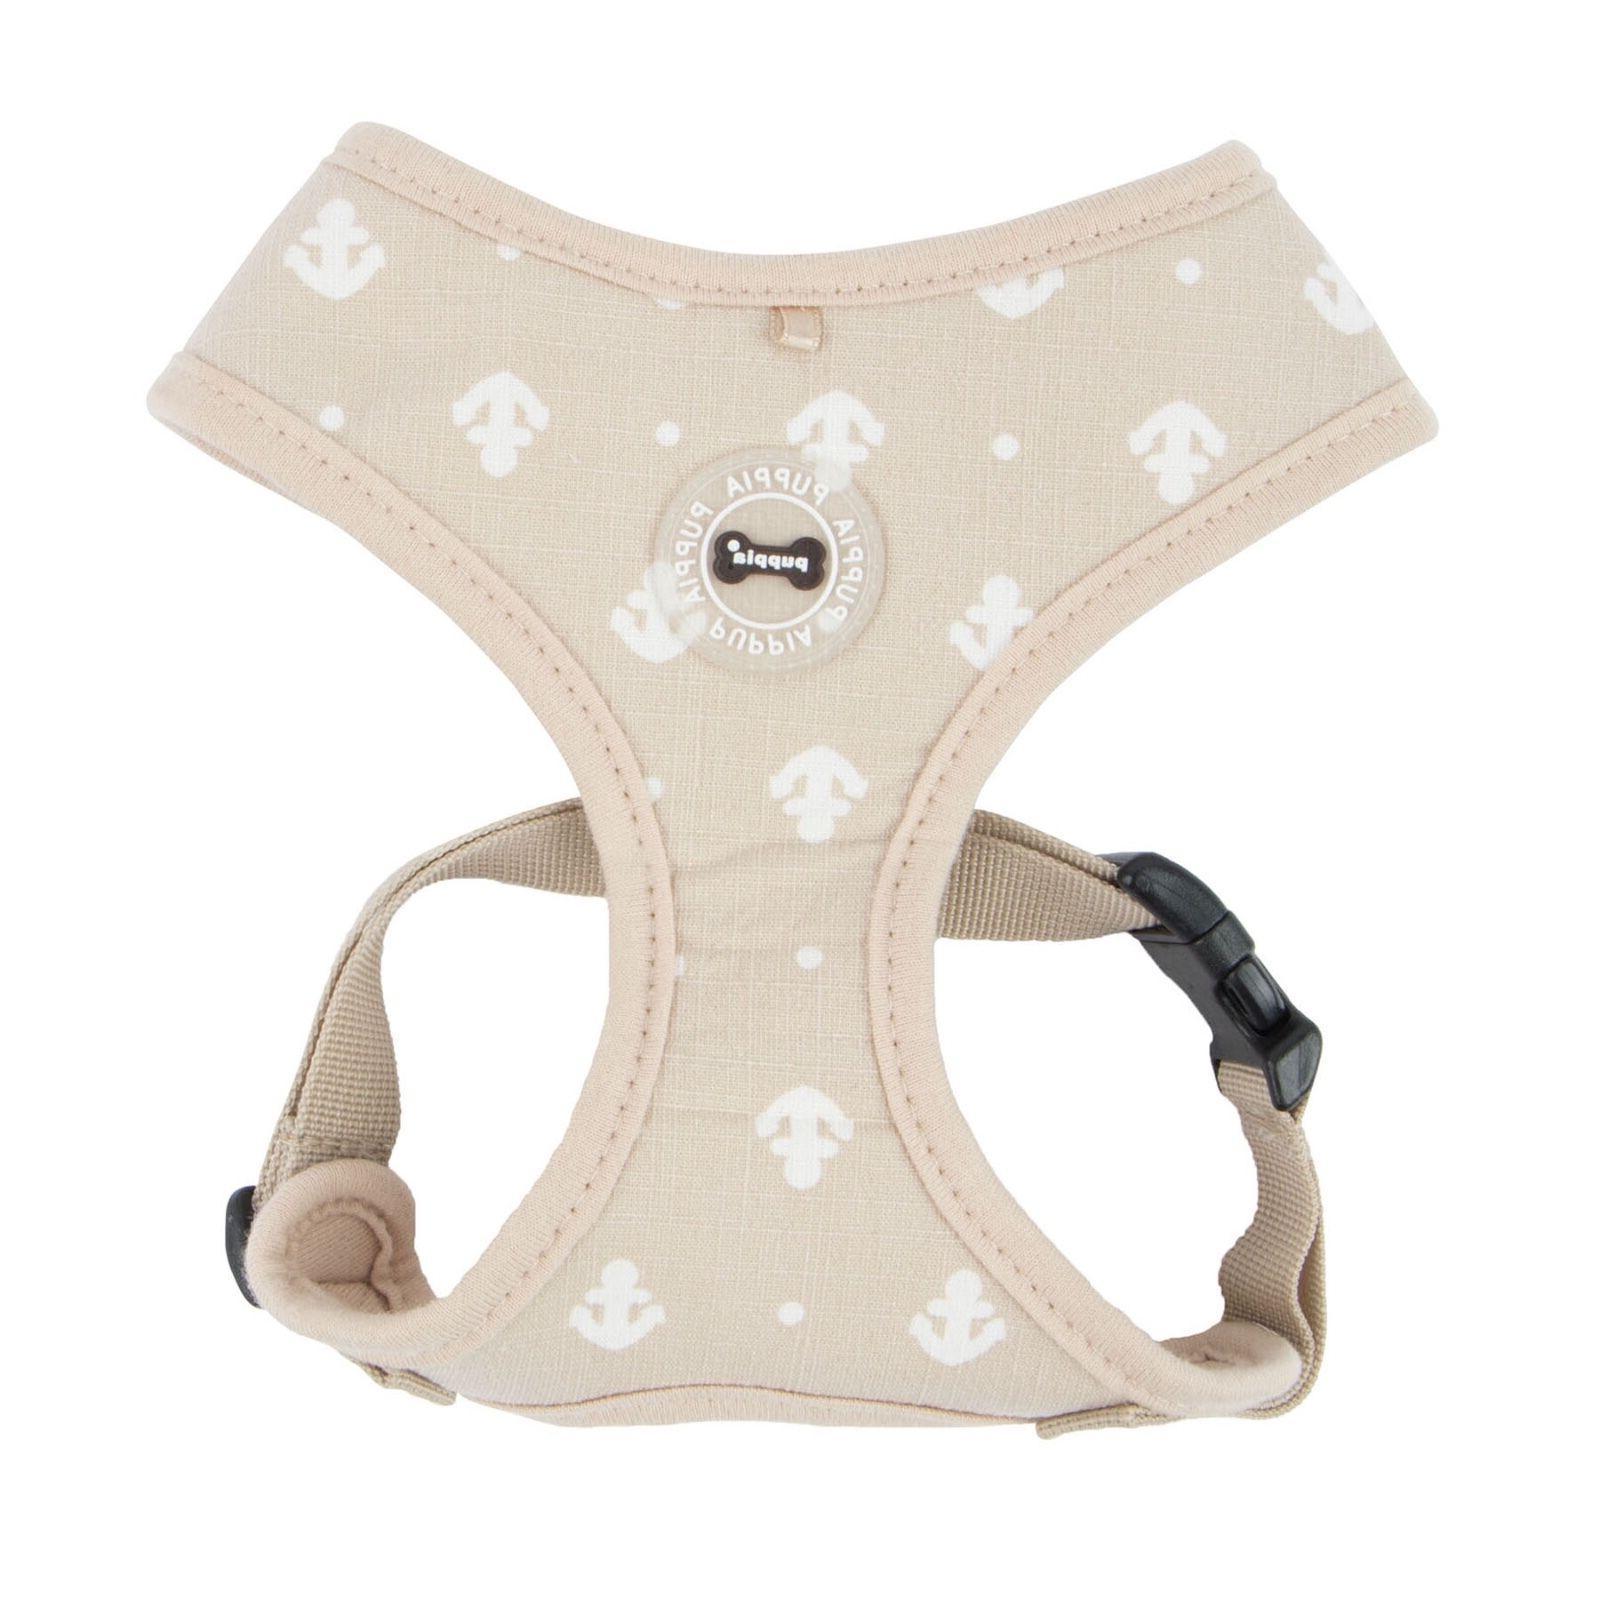 Dog Puppy Harness - Puppia - Ernest - Beige - Choose Size